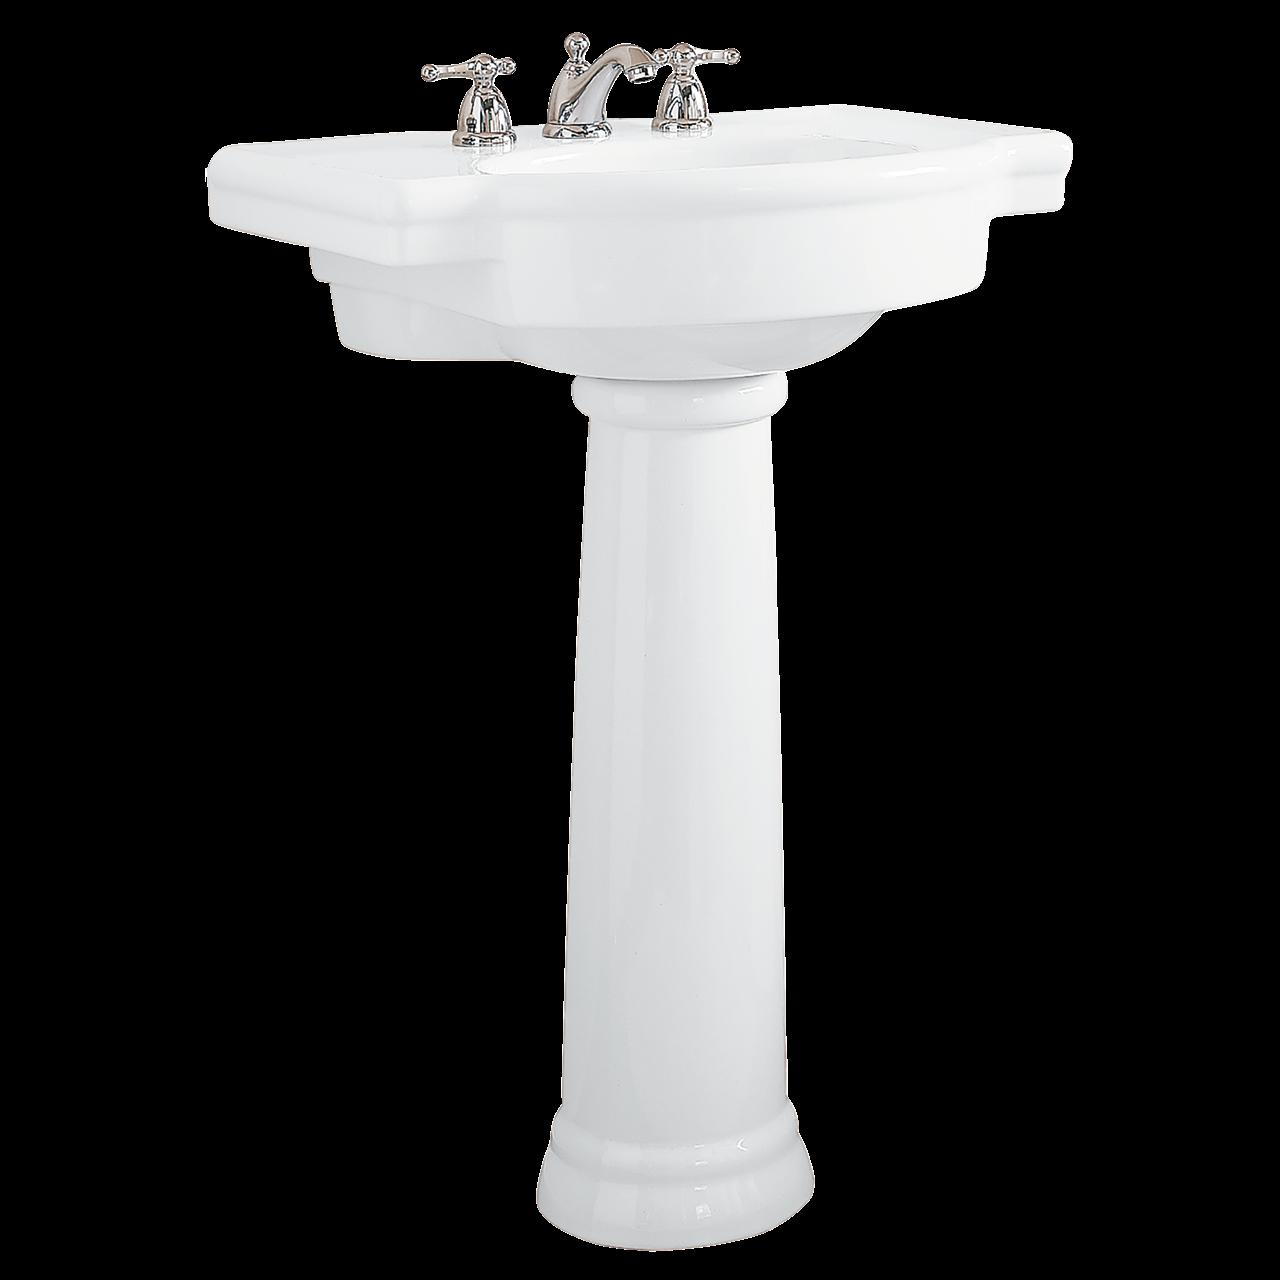 Clipart bathroom bathroom stall. Retrospect inch pedestal sink